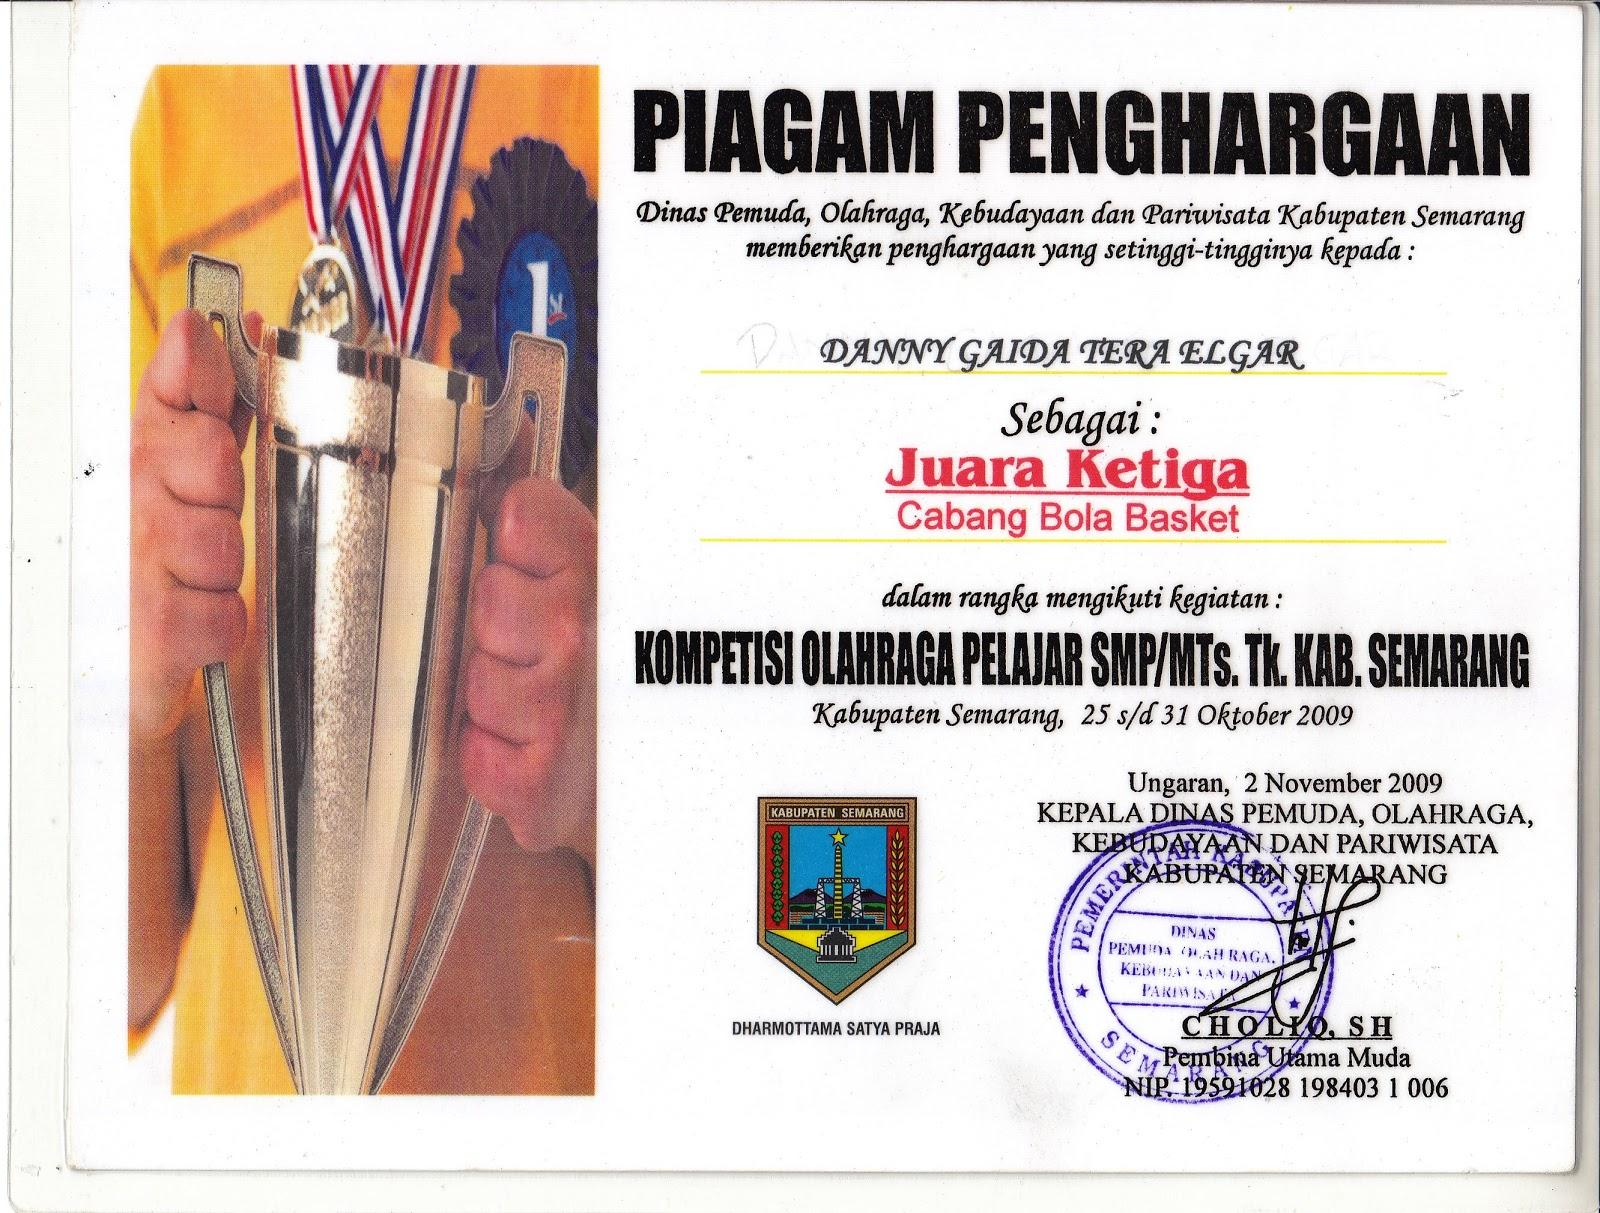 Piagam Penghargaan Kejuaraan Bola Basket Tingkat Kabupaten Semarang (Oktober 2009)